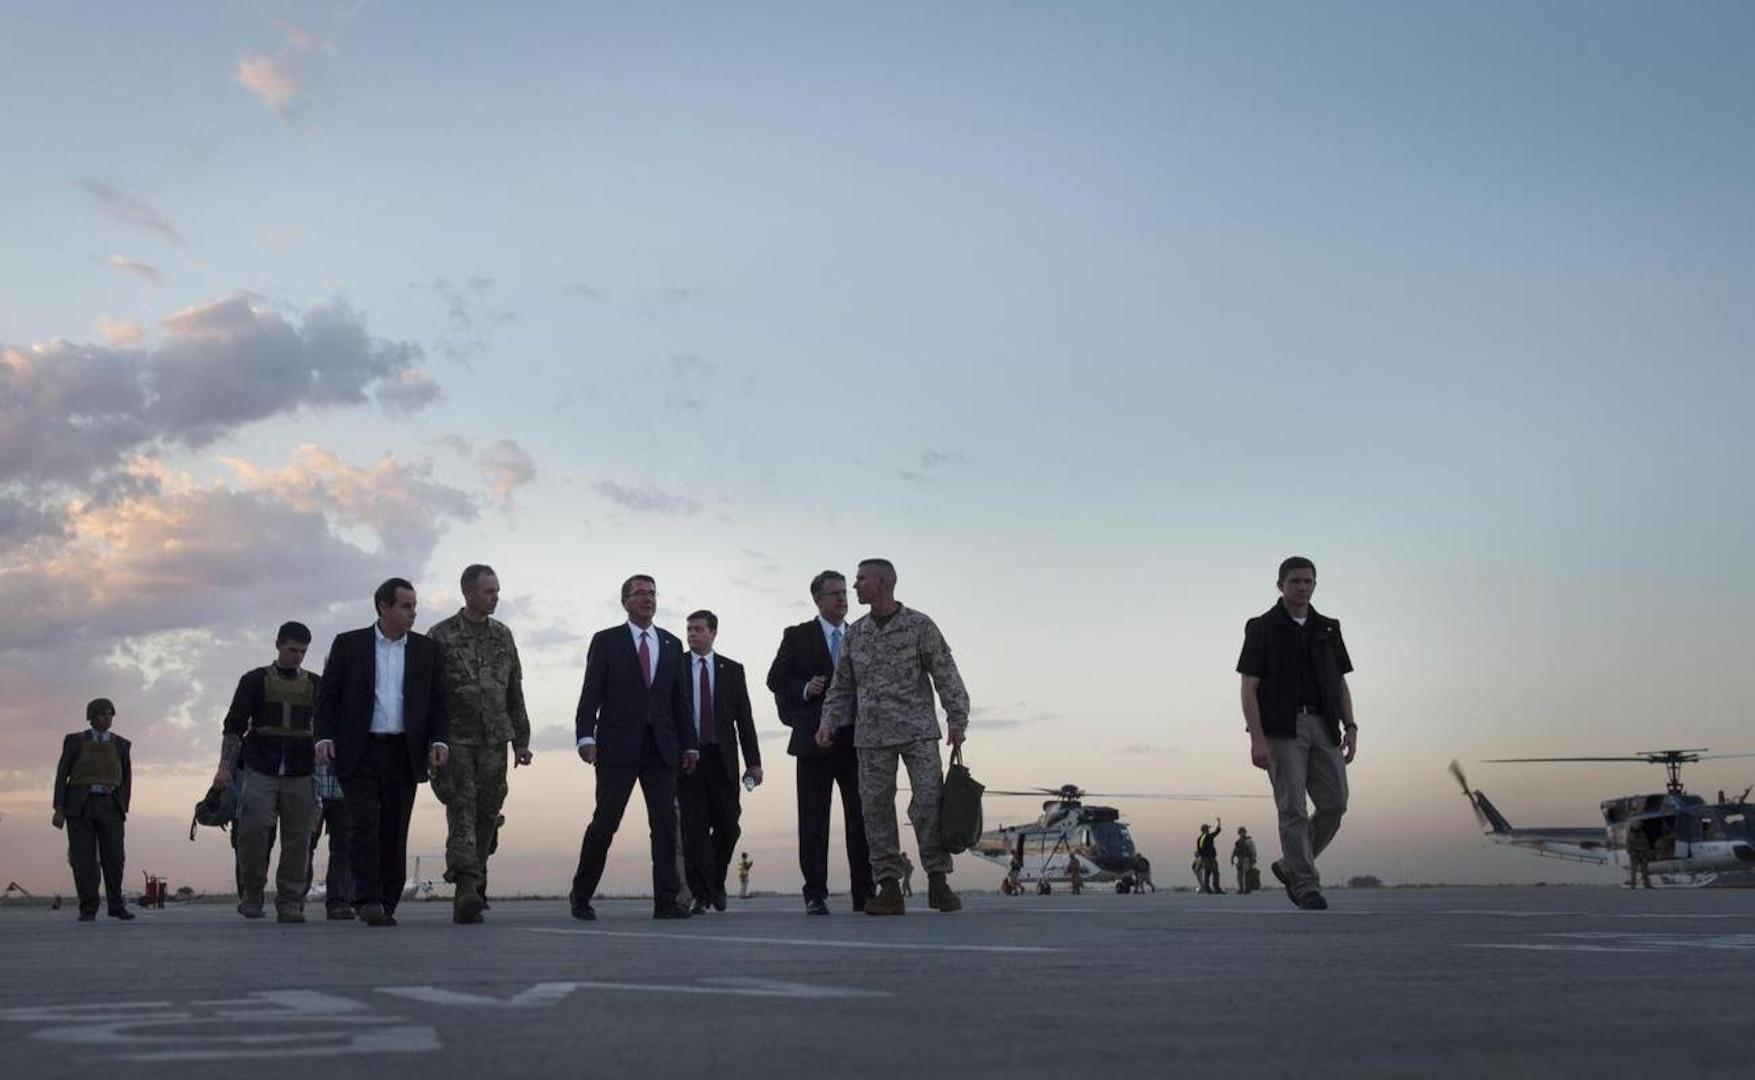 Defense Secretary Ash Carter, center, departs the Baghdad International Airport, April 18, 2016. (DoD photo by U.S. Air Force Senior Master Sgt. Adrian Cadiz)